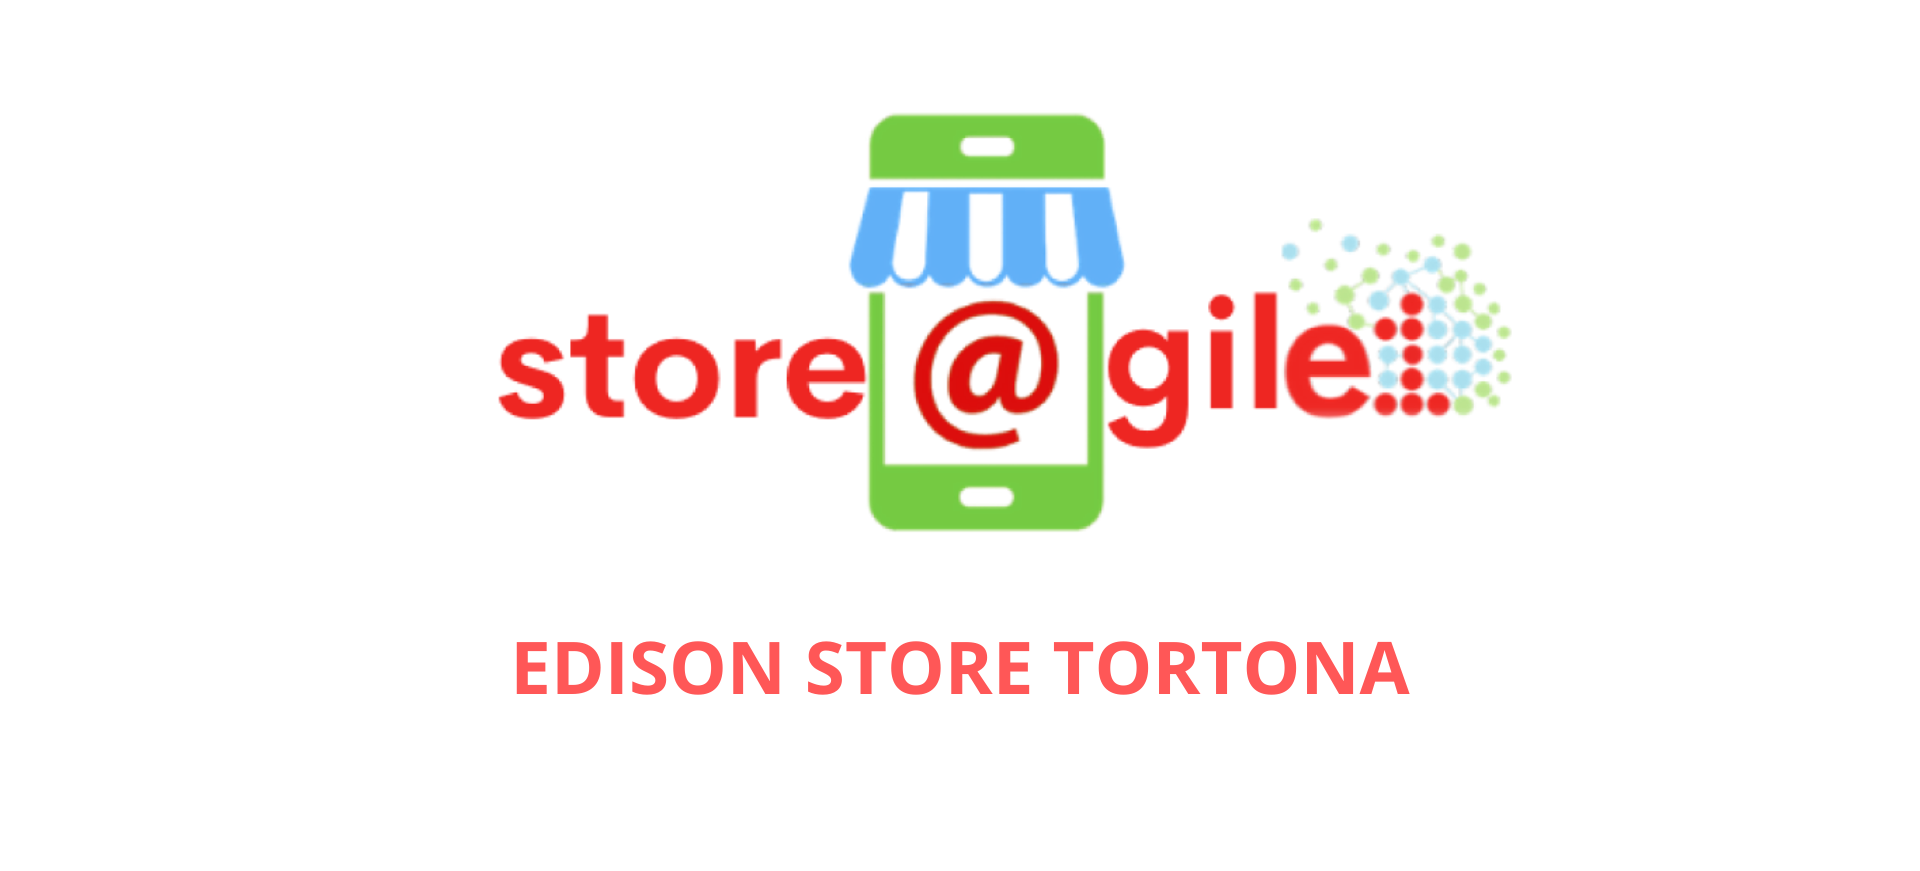 Edison-DHL-Vodafone Store Tortona